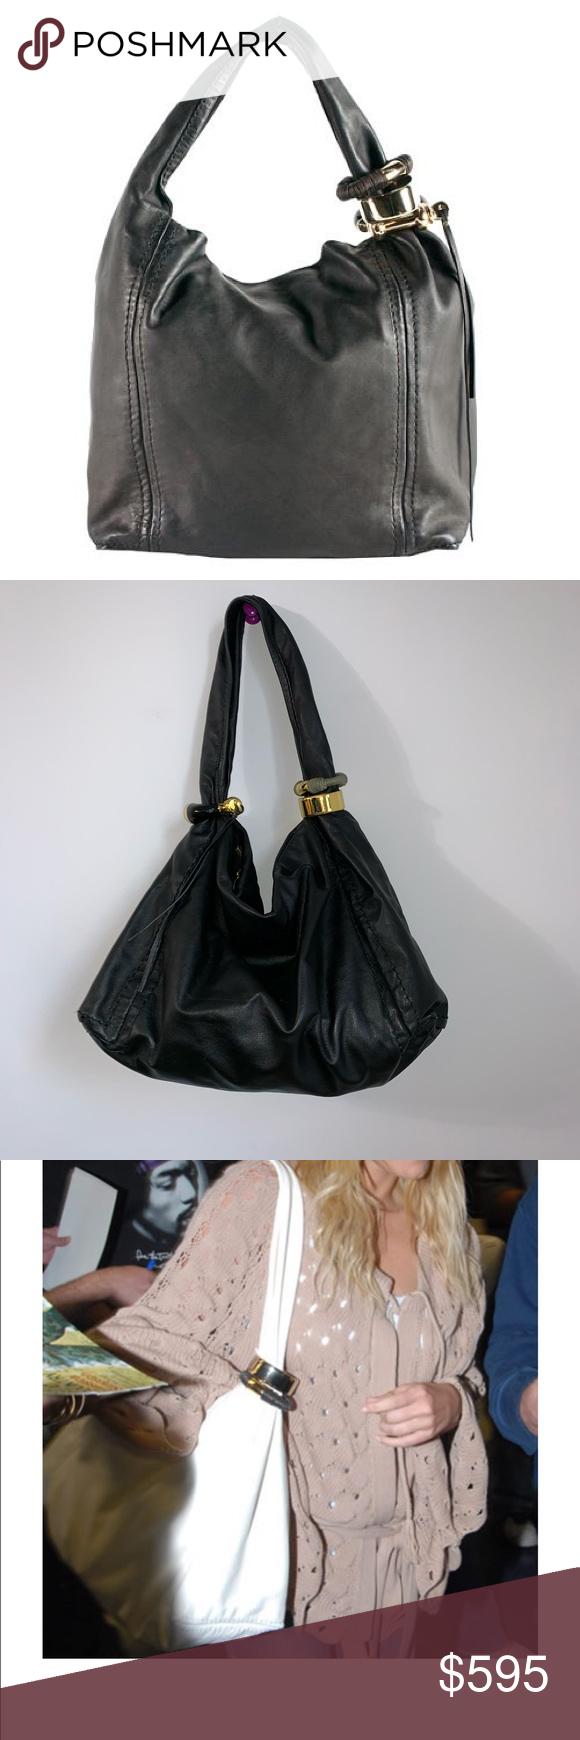 "b70e9106d9 Authentic Jimmy Choo Saba hobo leather bag black Jimmy Choo bag Excellent  condition Measures 20""x13"" drop 13"" Jimmy Choo Bags Hobos"